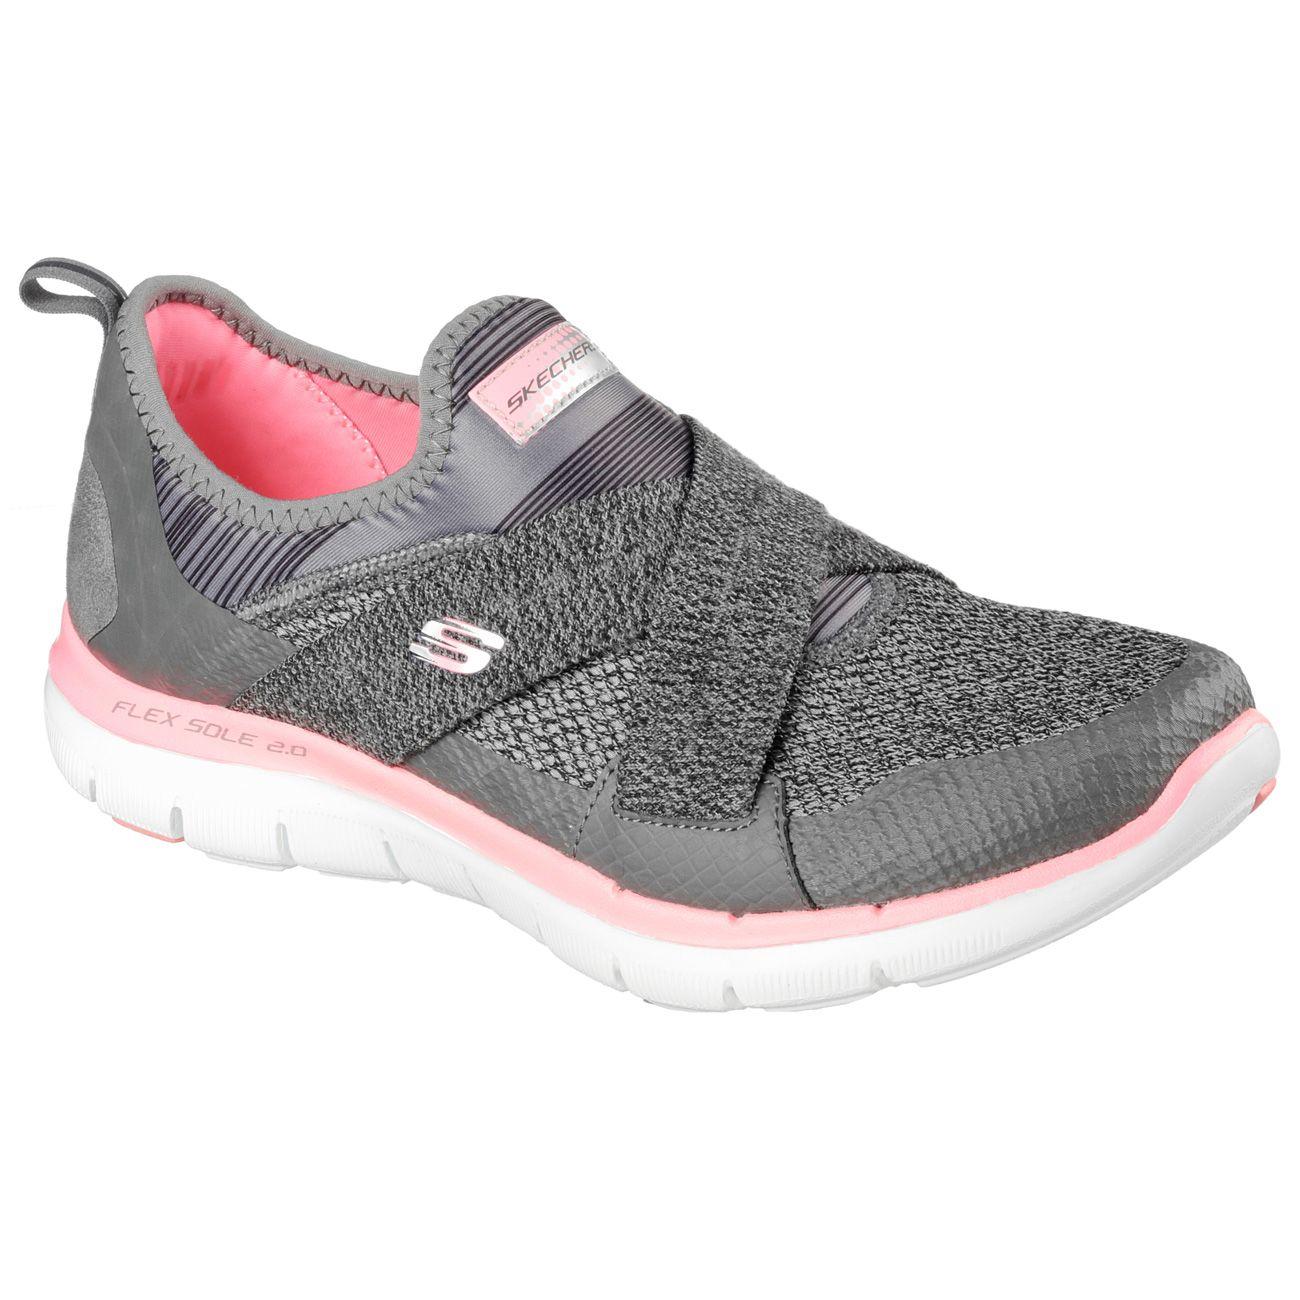 skechers sport flex appeal 2 0 slip on athletic shoes